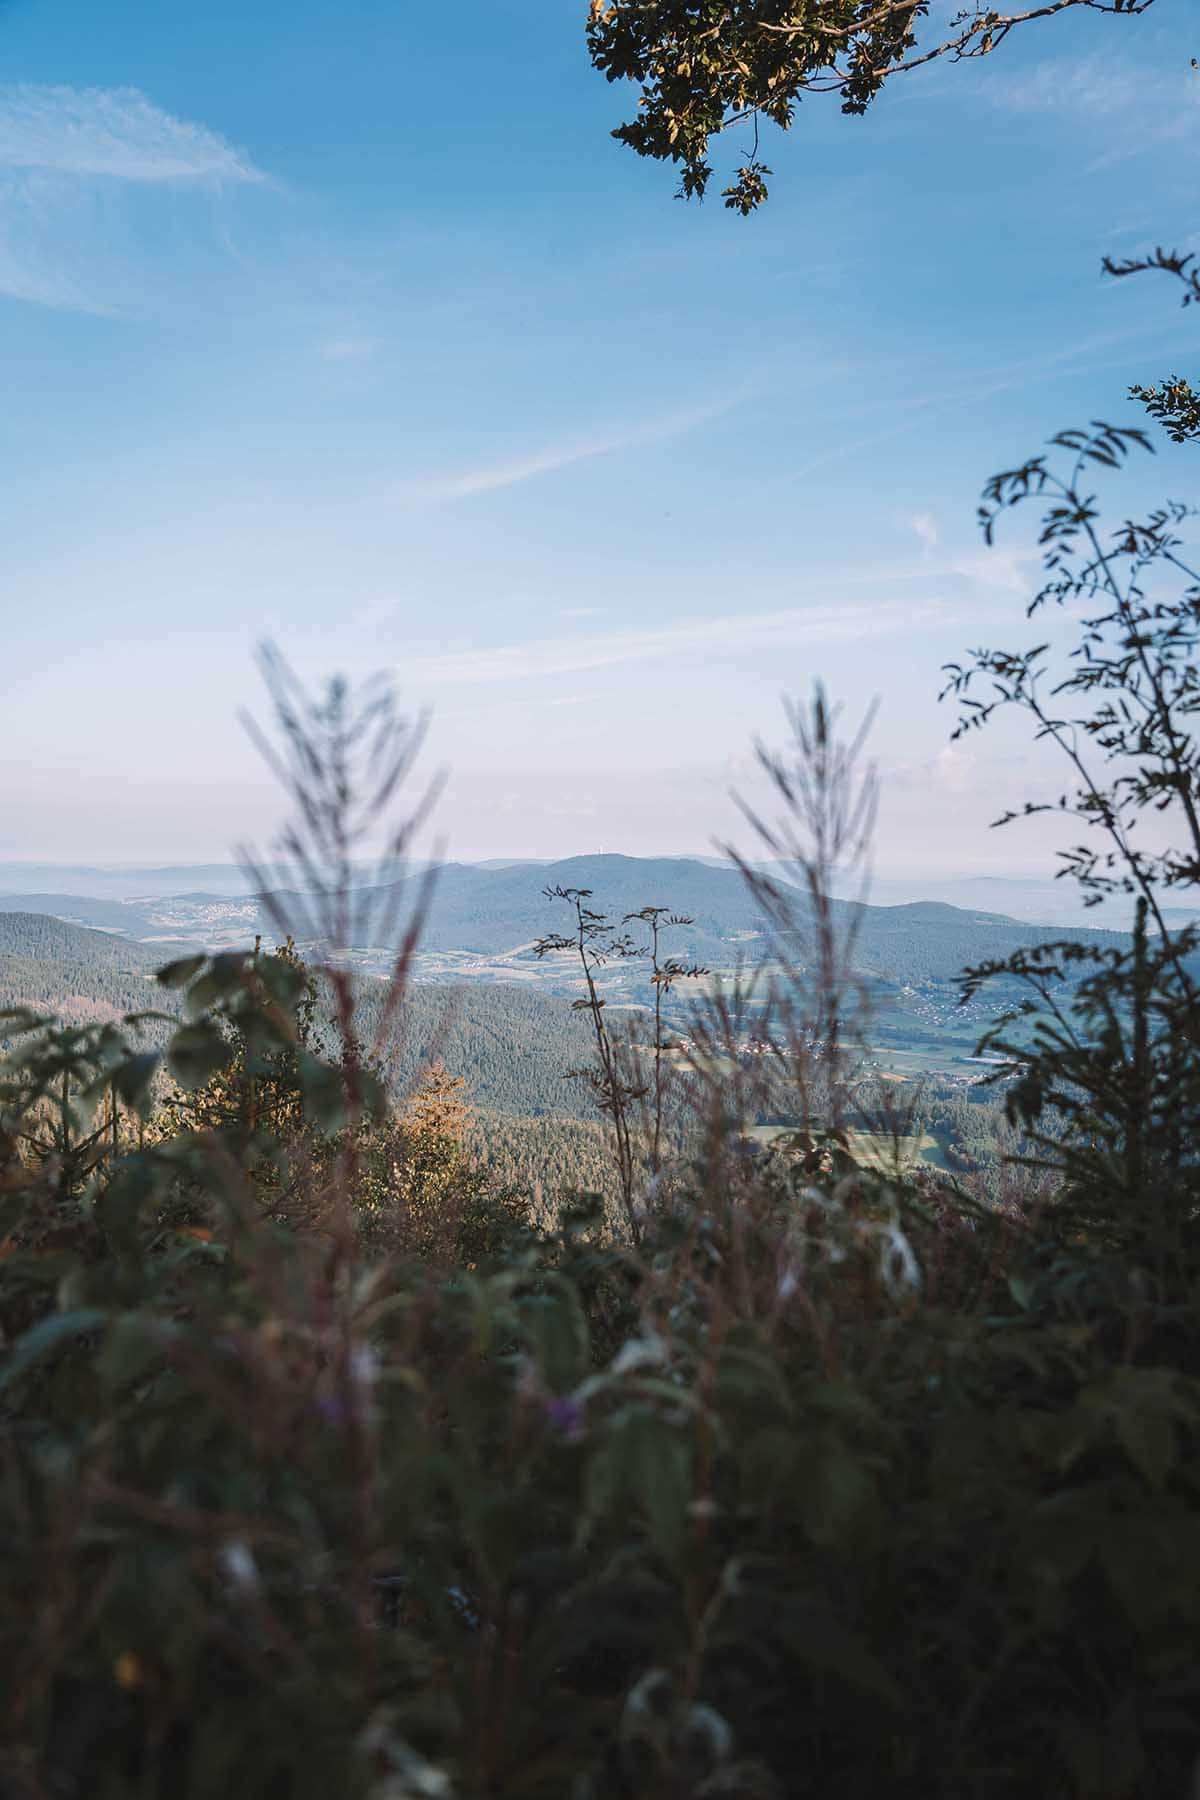 wandern-muehlriegel-oedriegel-skywalk-panorama-bayerwald